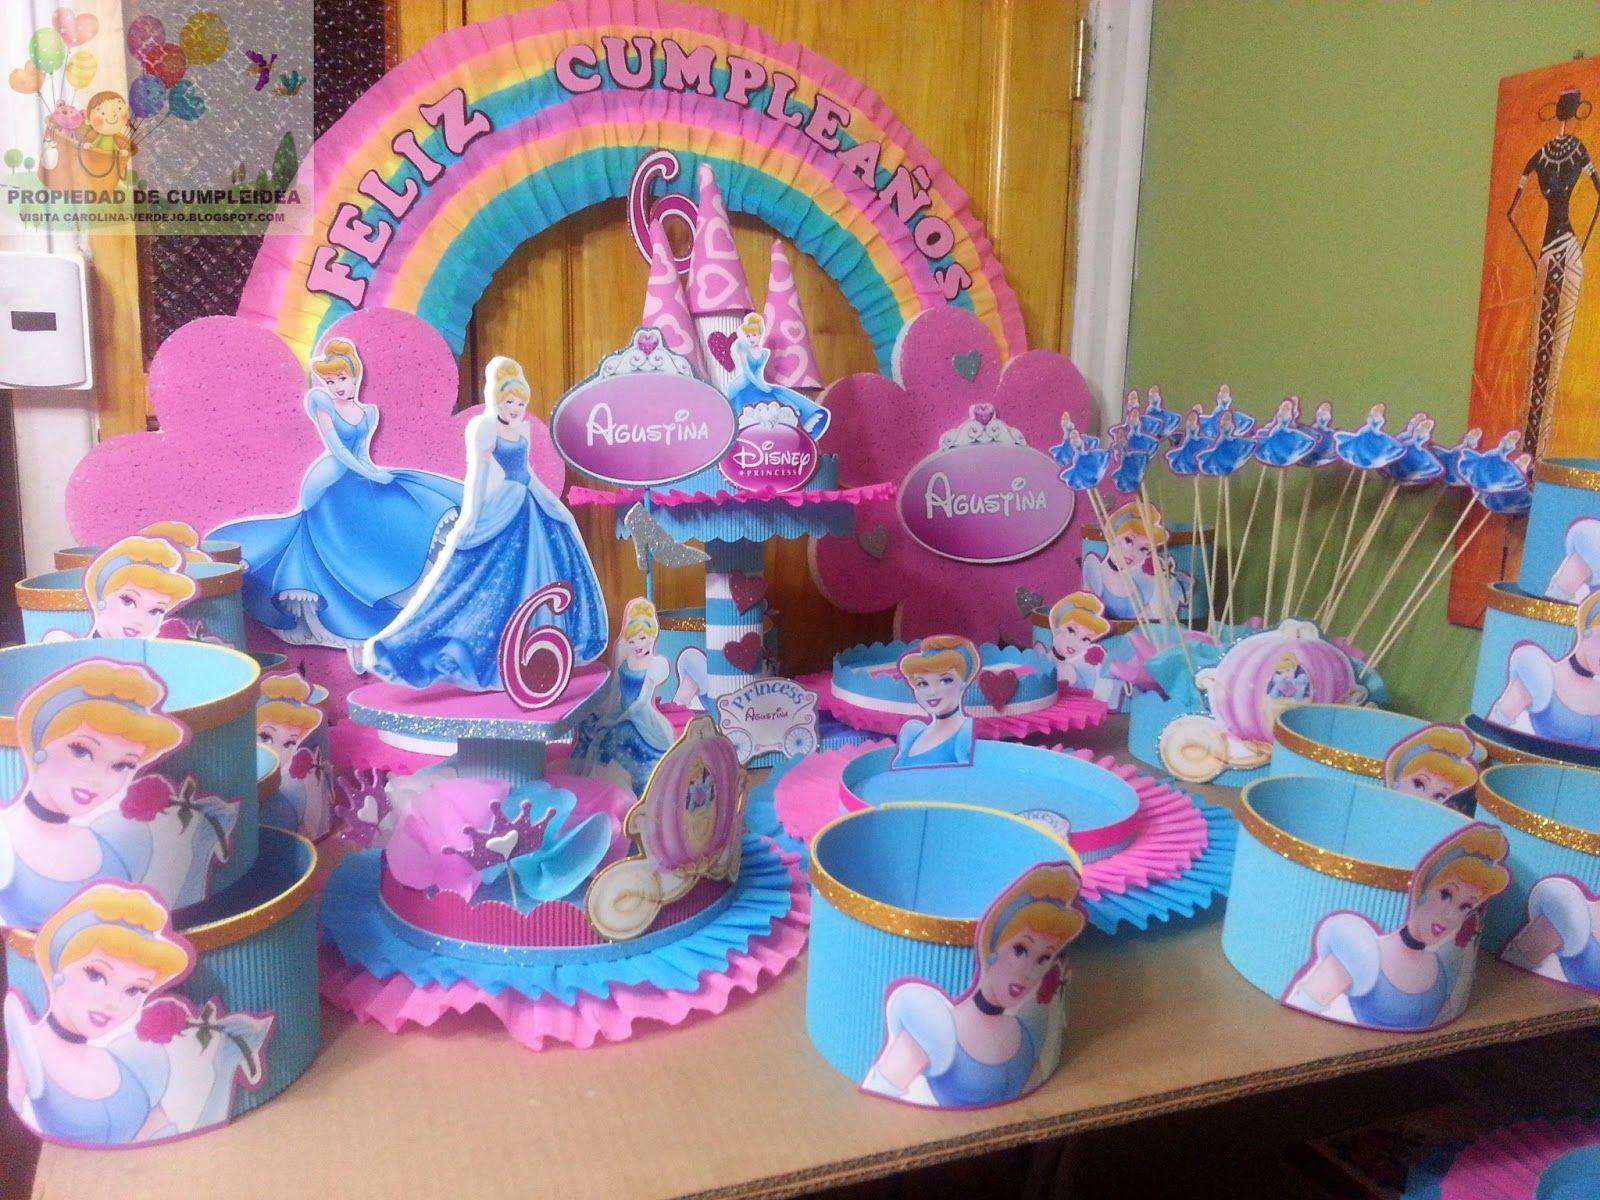 infantiles cenicienta fiesta abrigos princesas eventos partido de la princesa ideas de cumpleaos